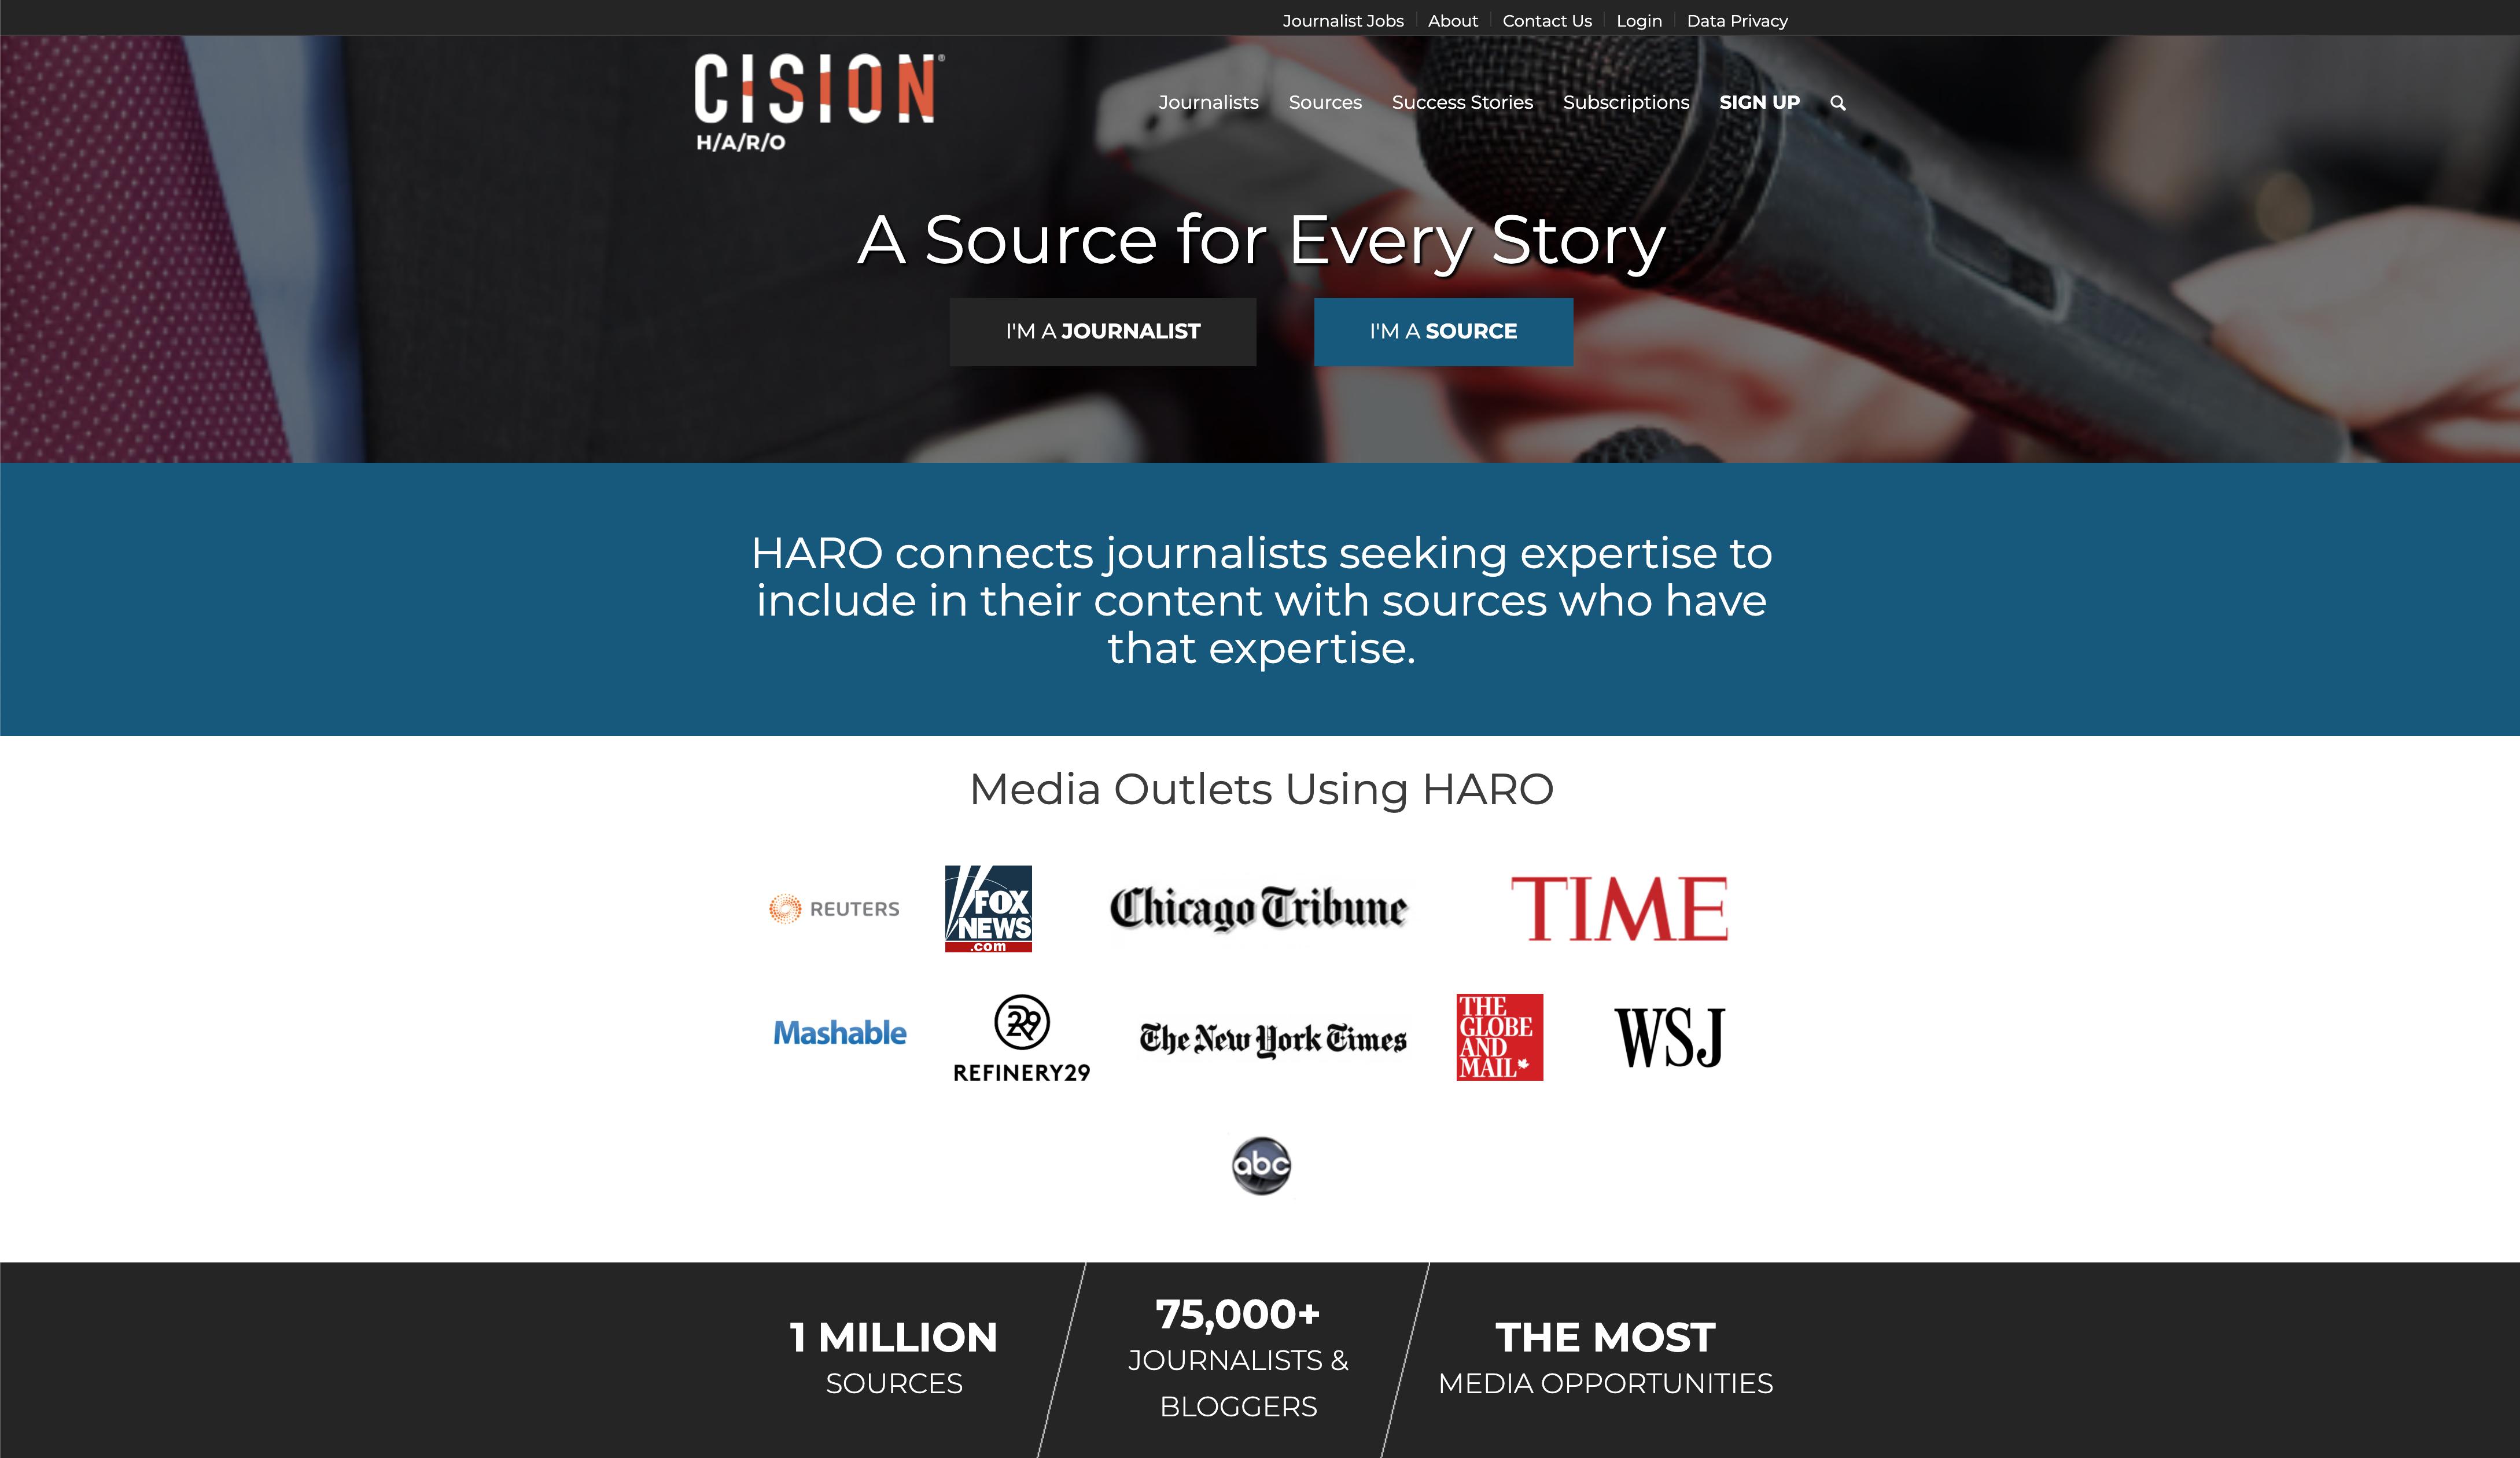 HARO website homepage screenshot